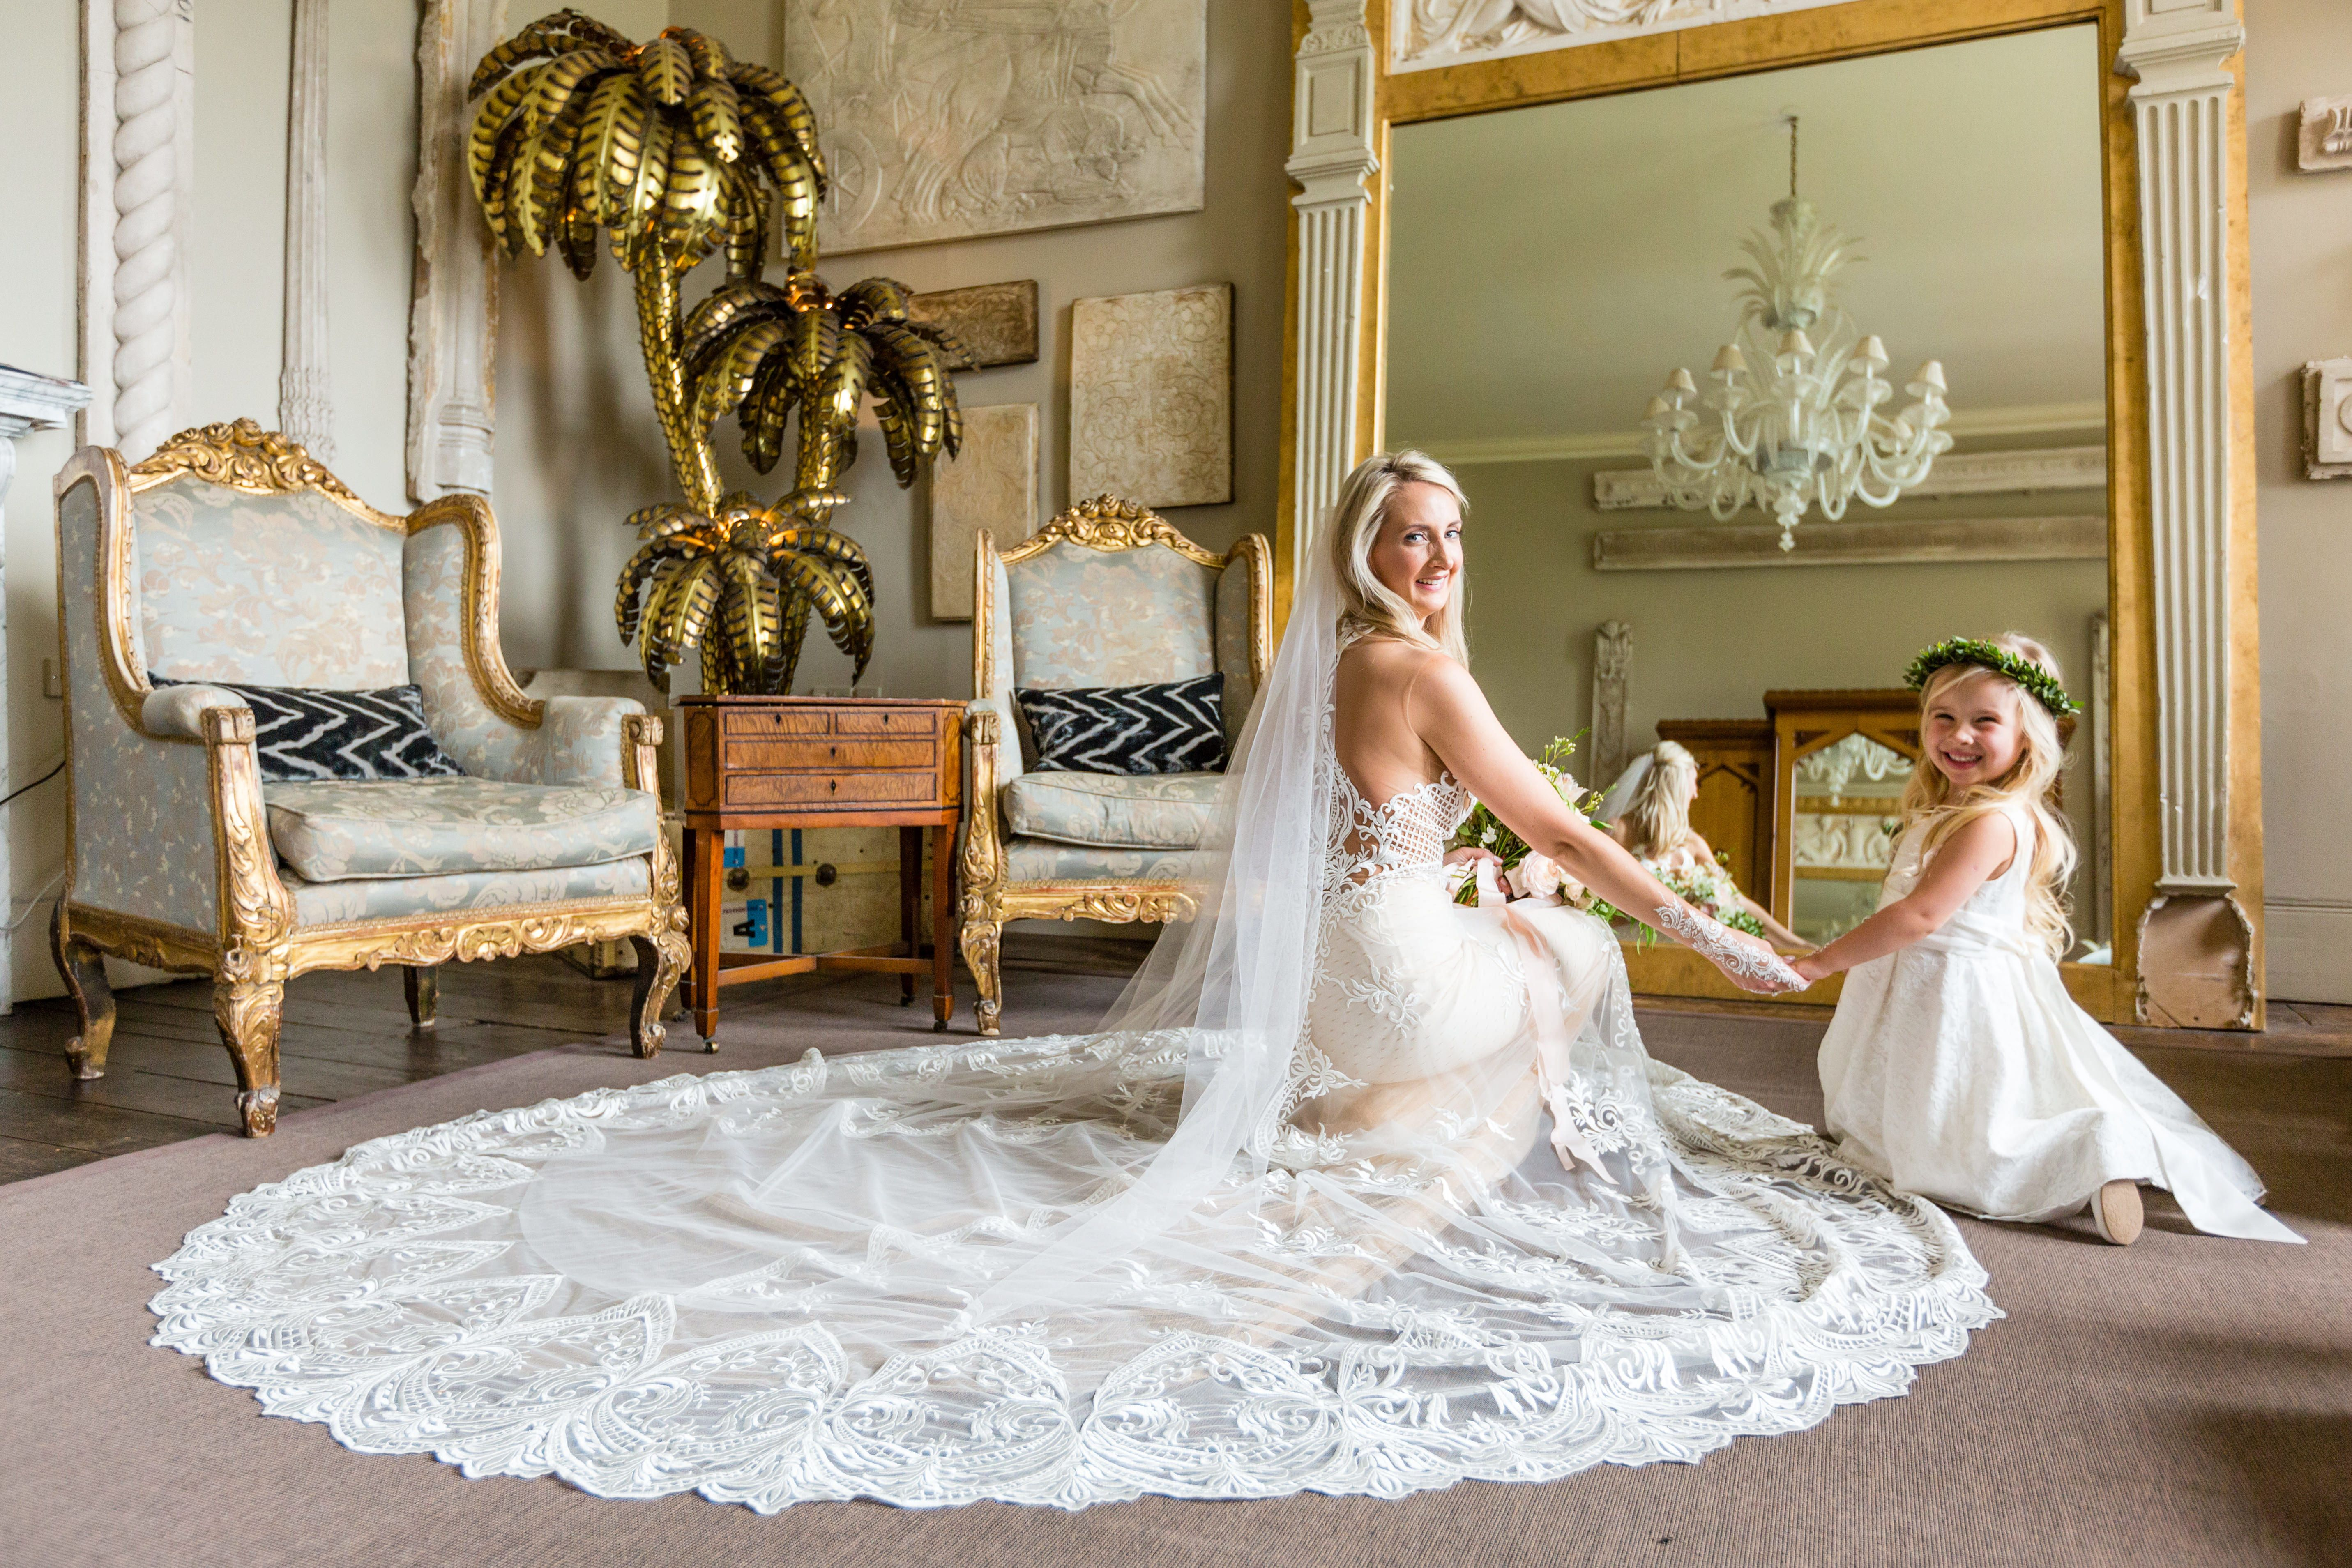 Luxury venues and wedding dress inspiration Wedding